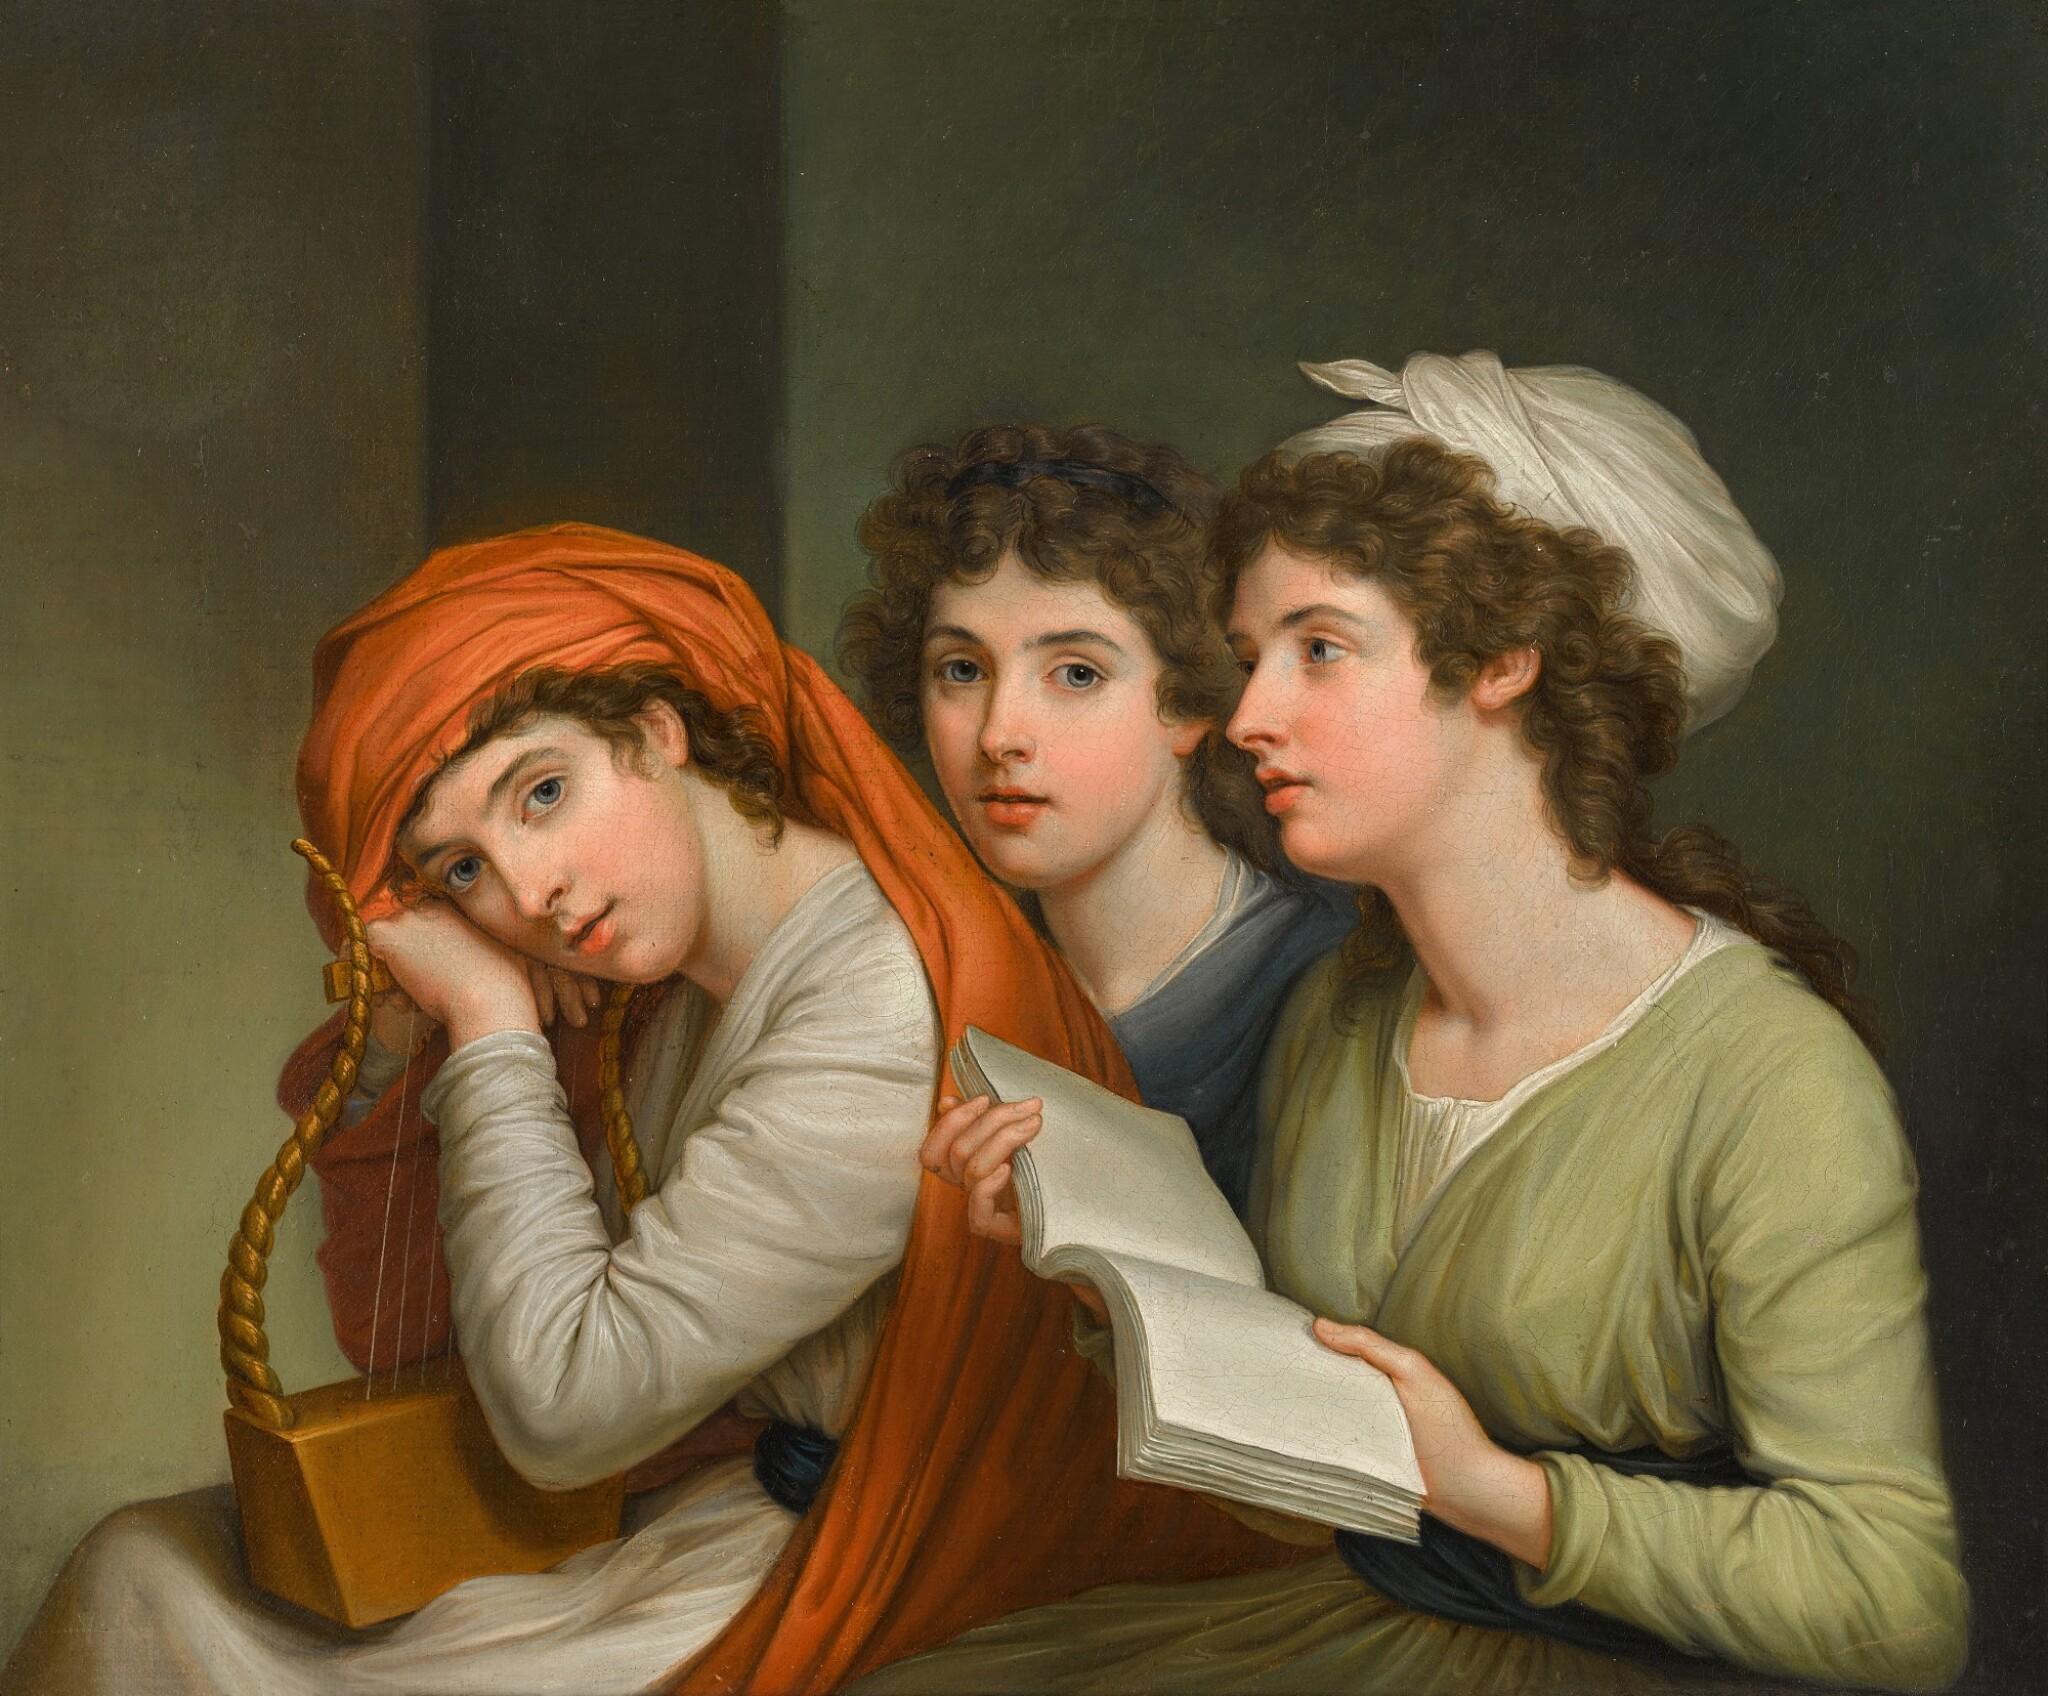 View full screen - View 1 of Lot 46. Triple portrait of Emma, Lady Hamilton (1765–1815), as the three Muses   《裝扮成三位繆斯的愛瑪・漢密爾頓夫人(1765–1815年)肖像》.